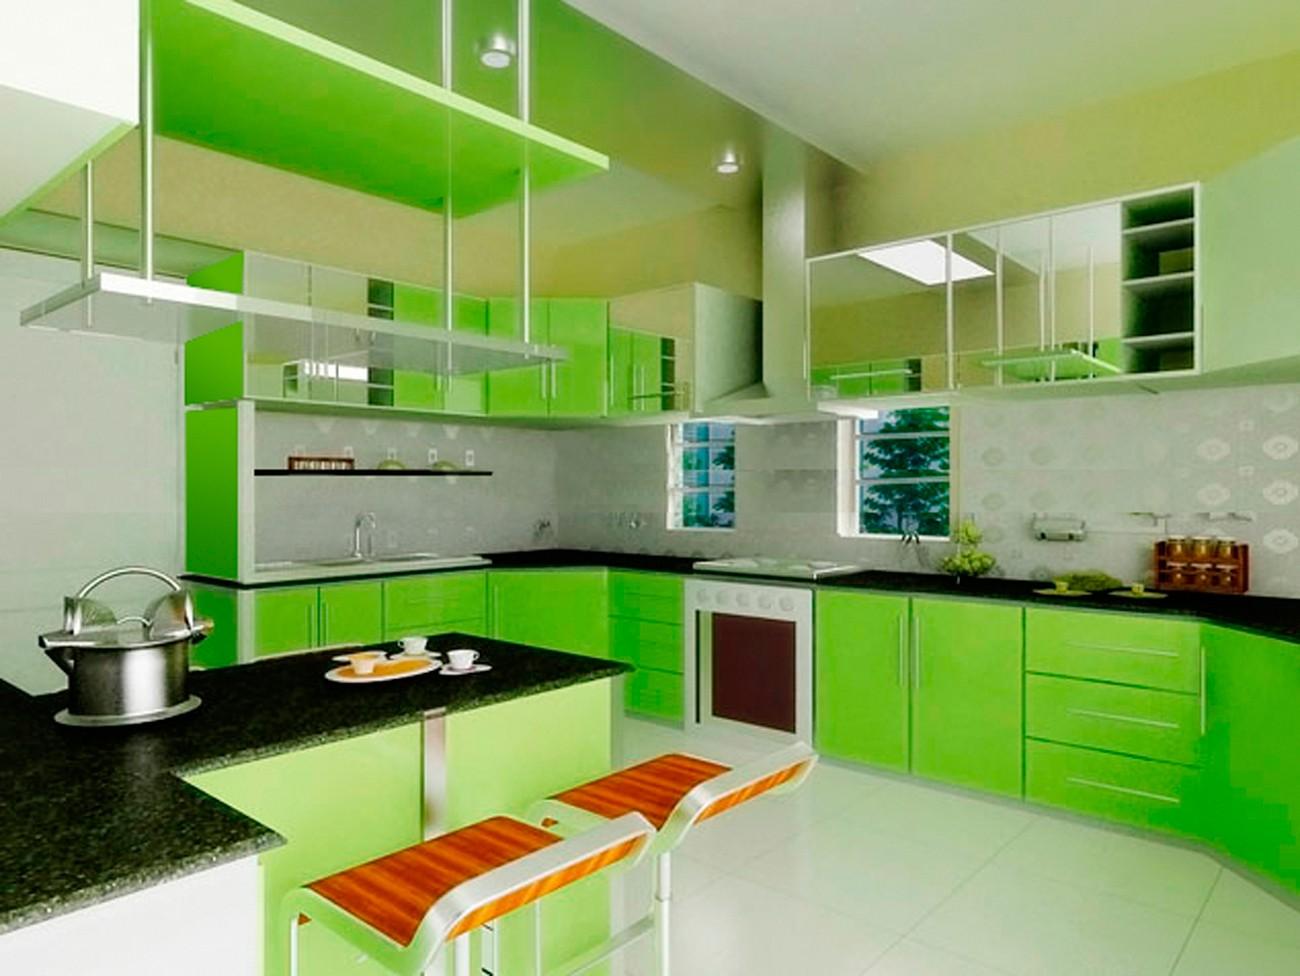 Фото интерьер зеленой кухни